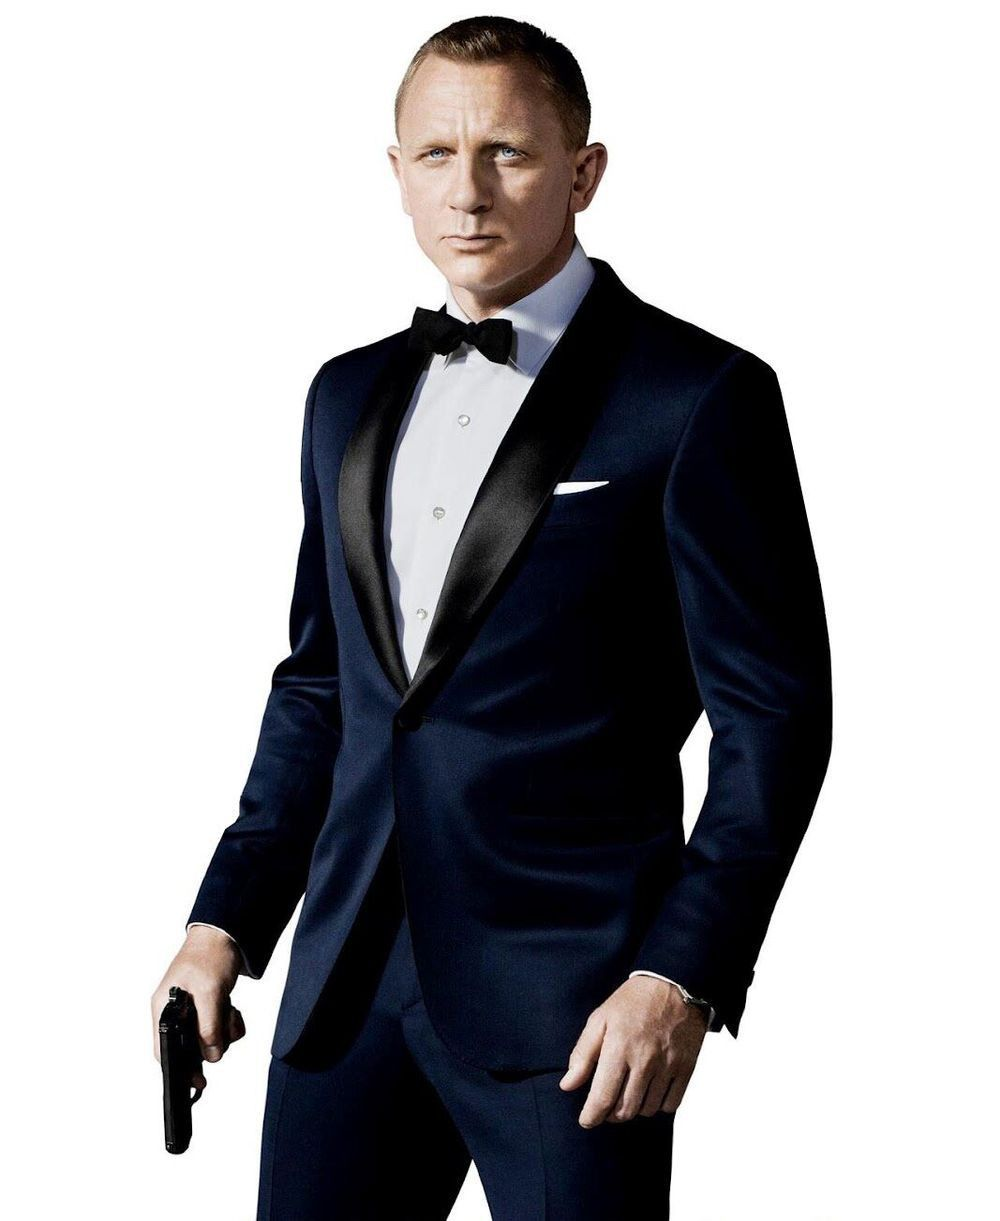 Groom Tuxedos Prom Wedding Suit (Jacket Pants Bow Tie) | Groom ...